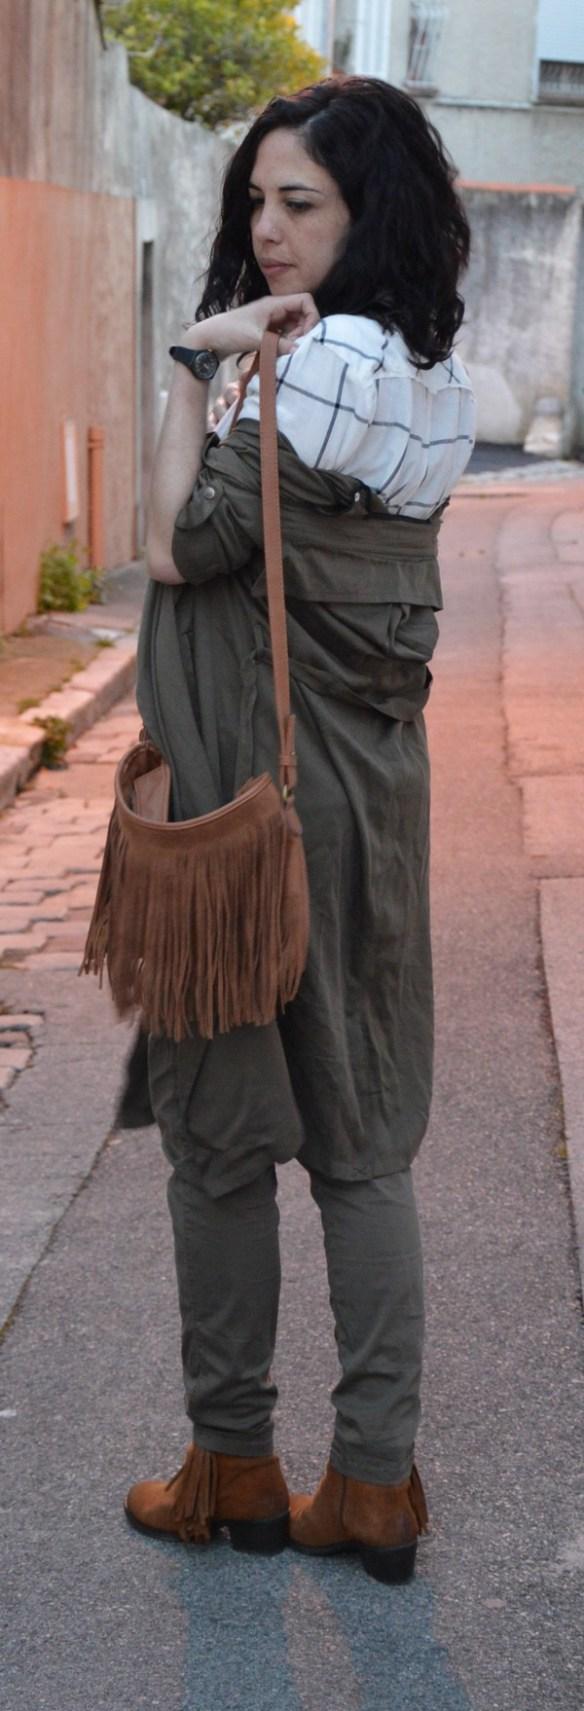 look-kaki-safari-outfit-masculin-feminin-camel-franges